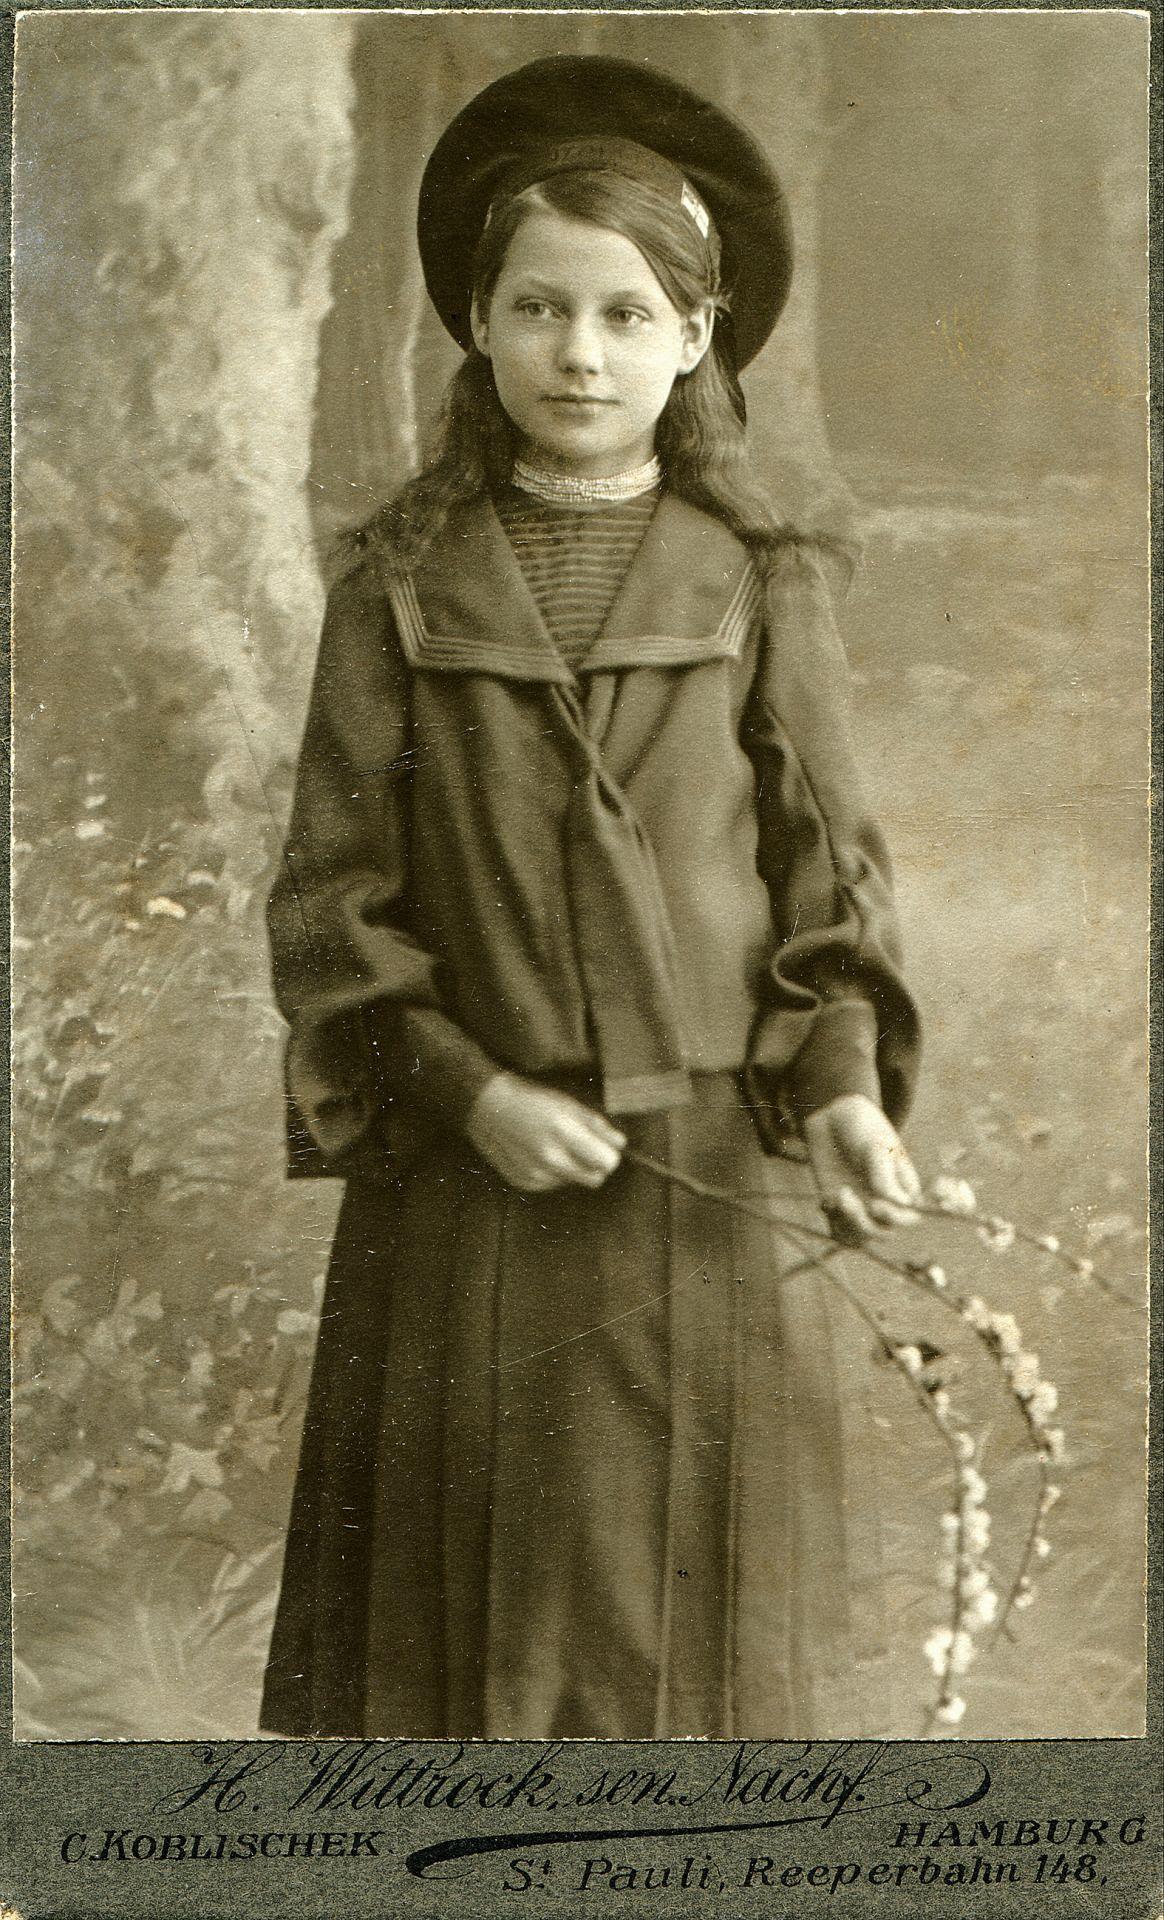 "onceuponatown: "" Portrait of a girl - Germany - c.1905 Studio: H.Wittrock, sen. Nachf. (C.Koblischek) - Hamburg """